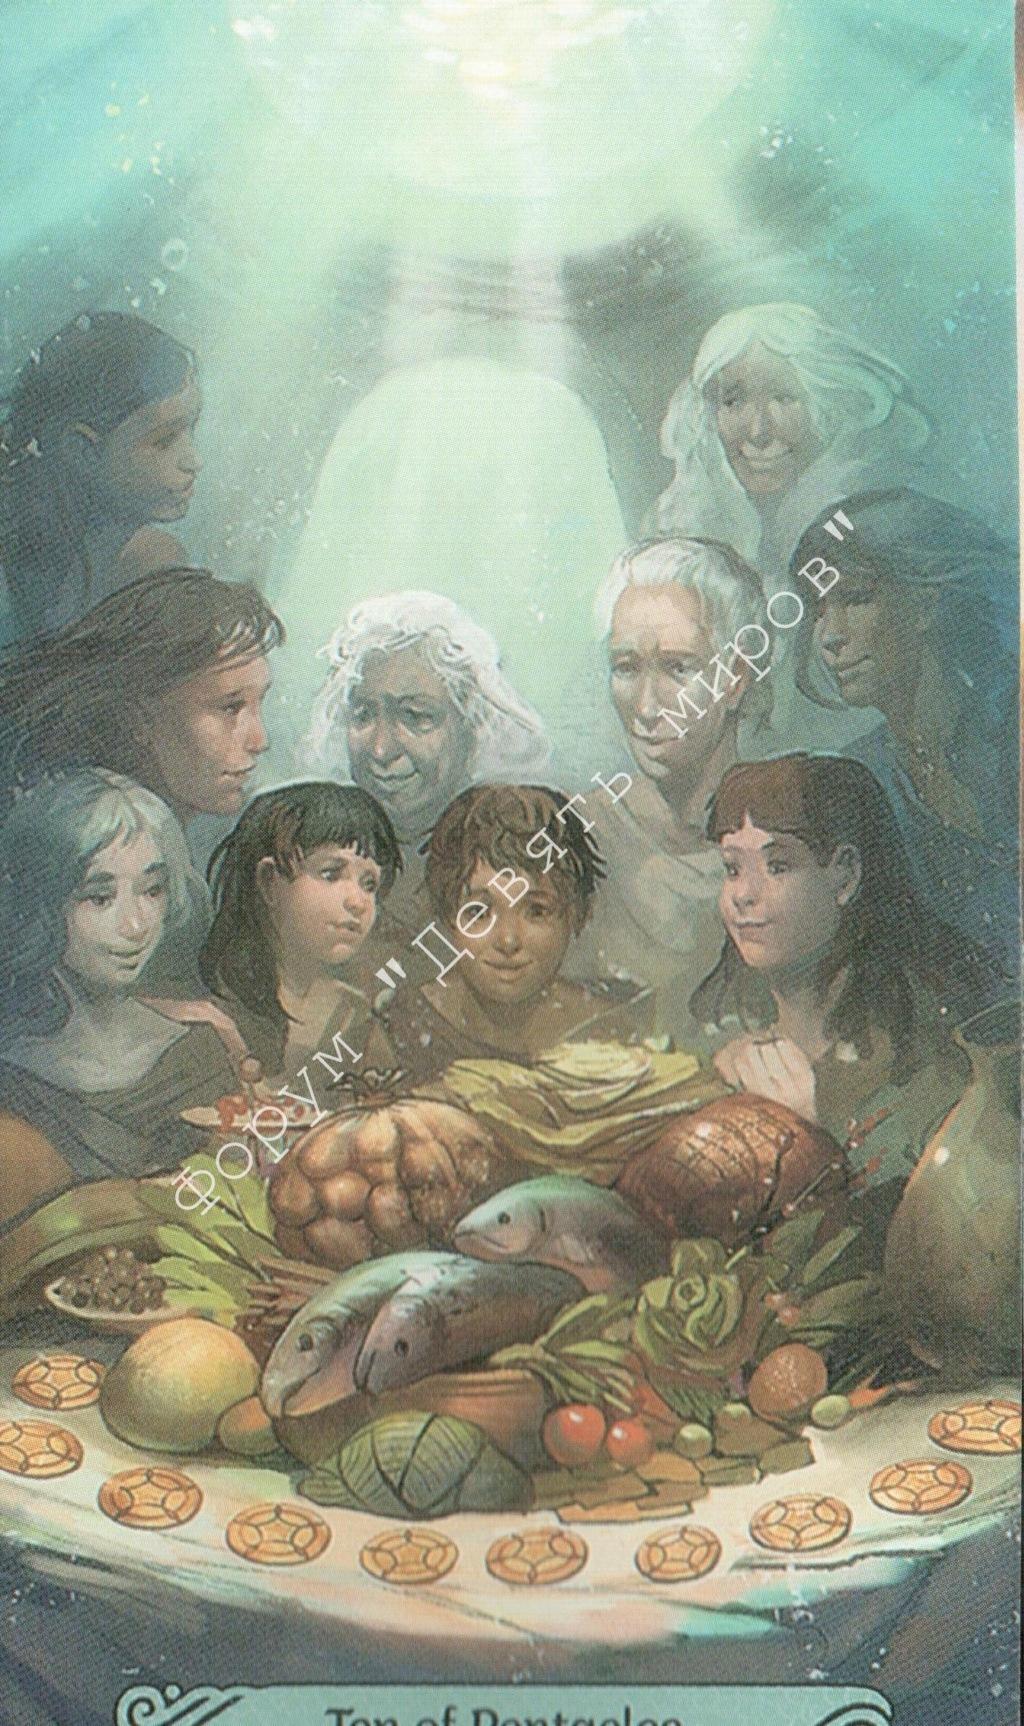 Таро Русалок (Mermaid Tarot) Water183